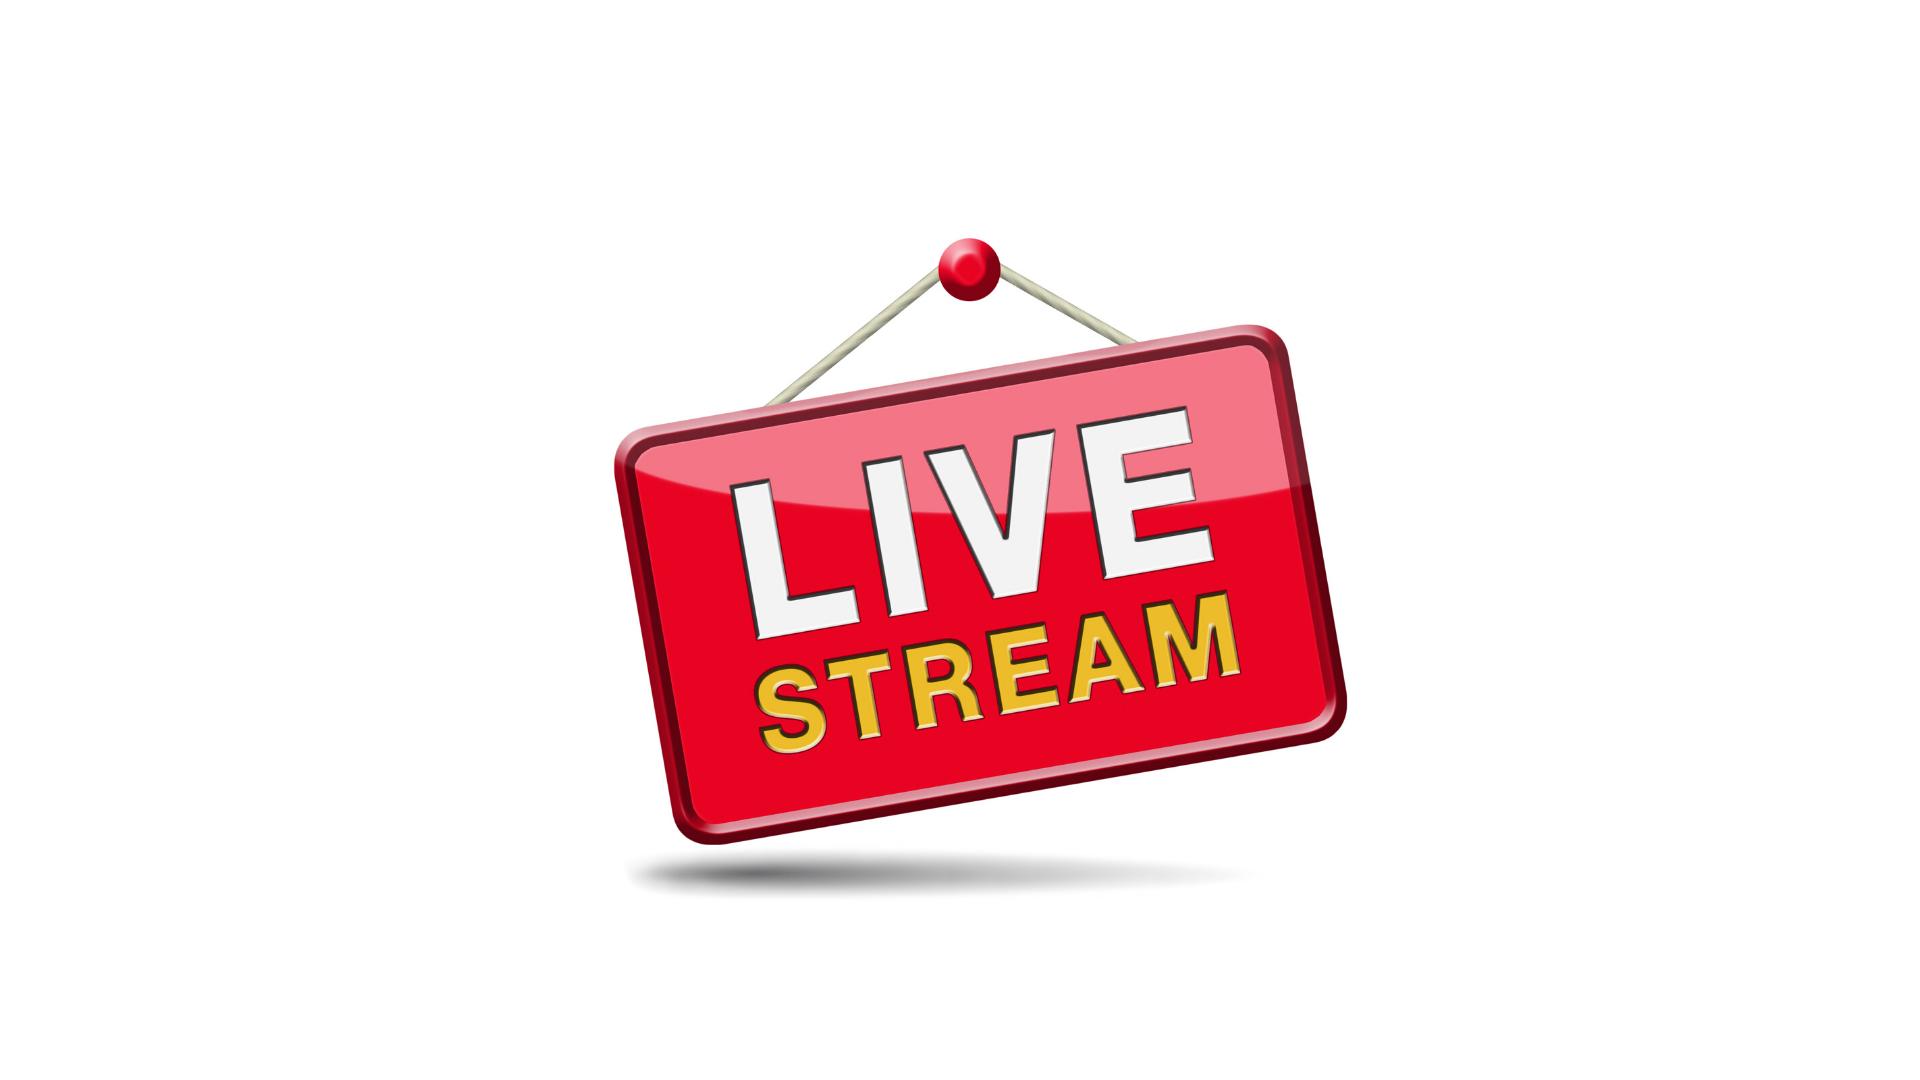 5 Ways to Live Stream on Facebook